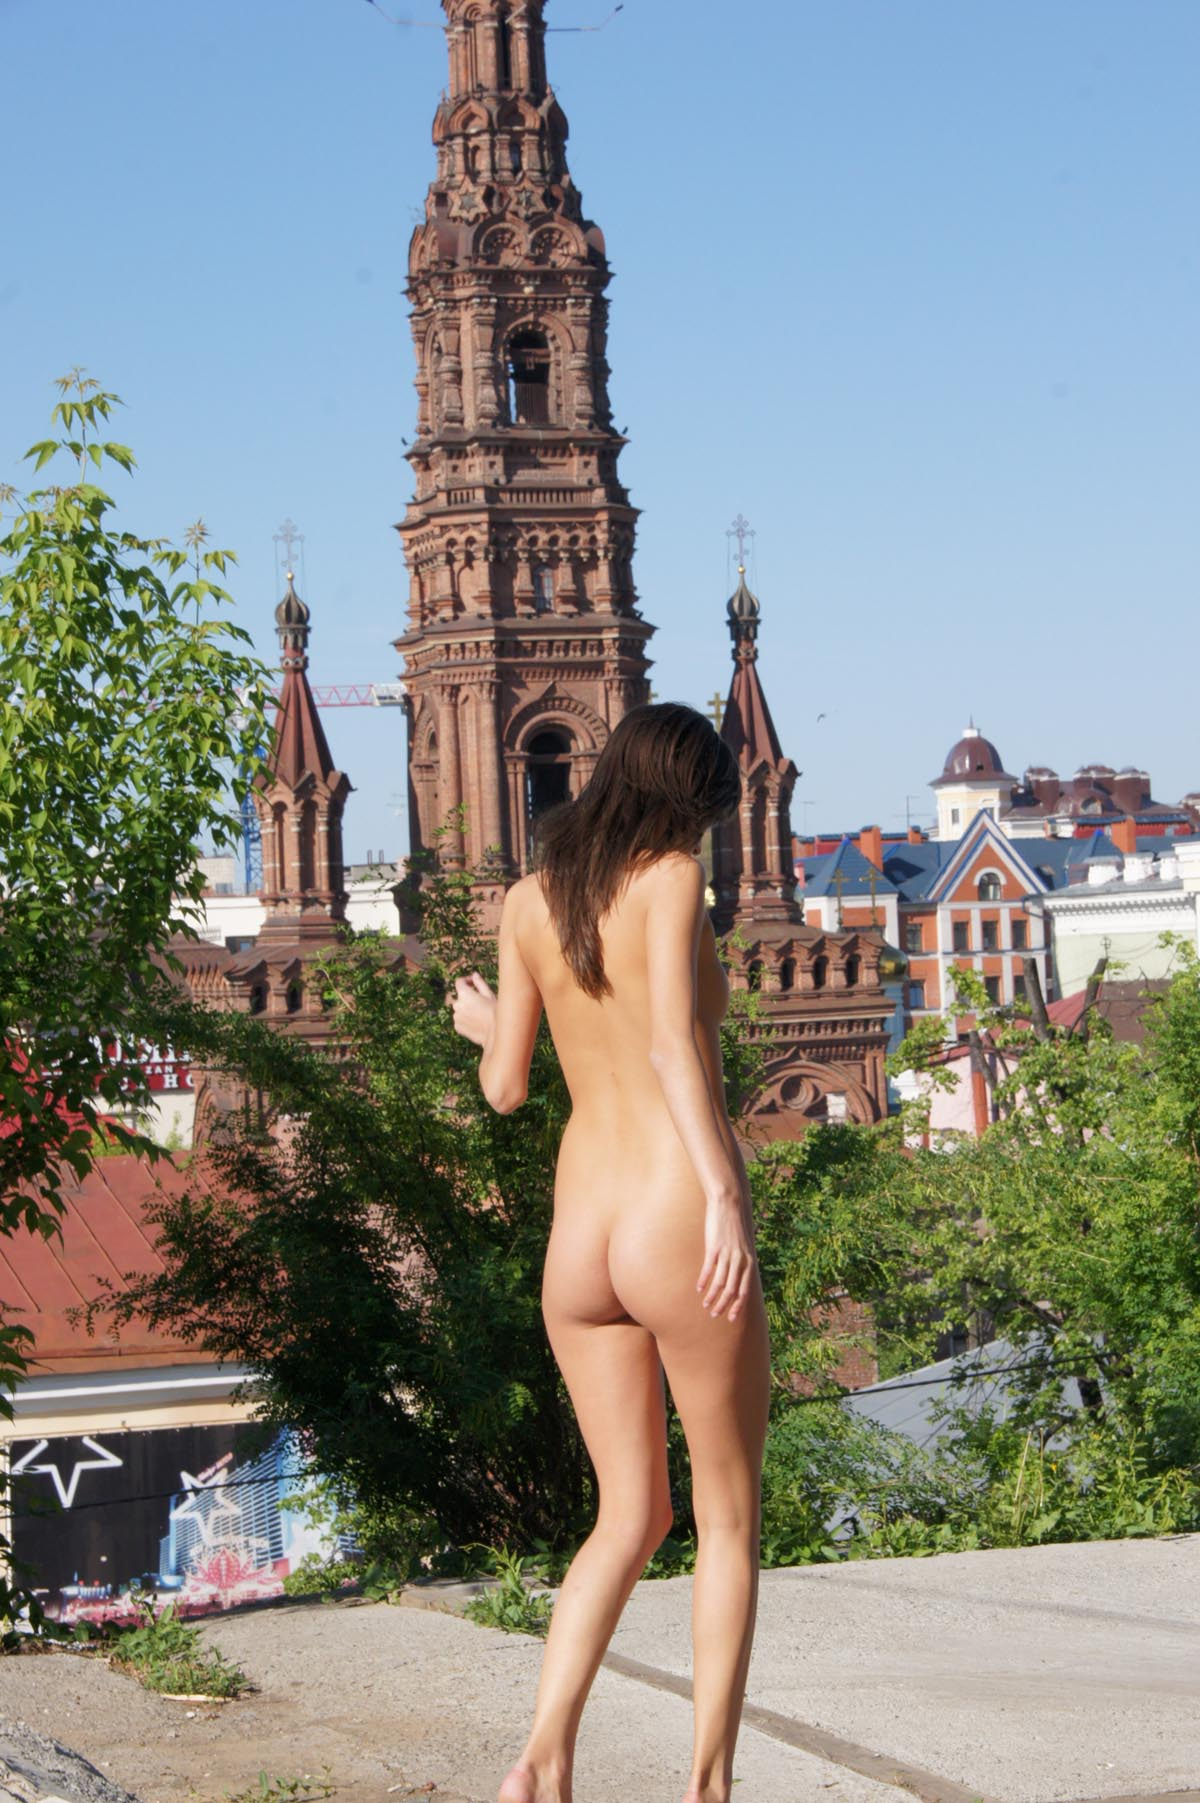 irina-k-naked-in-russia-kazan-nude-public-34